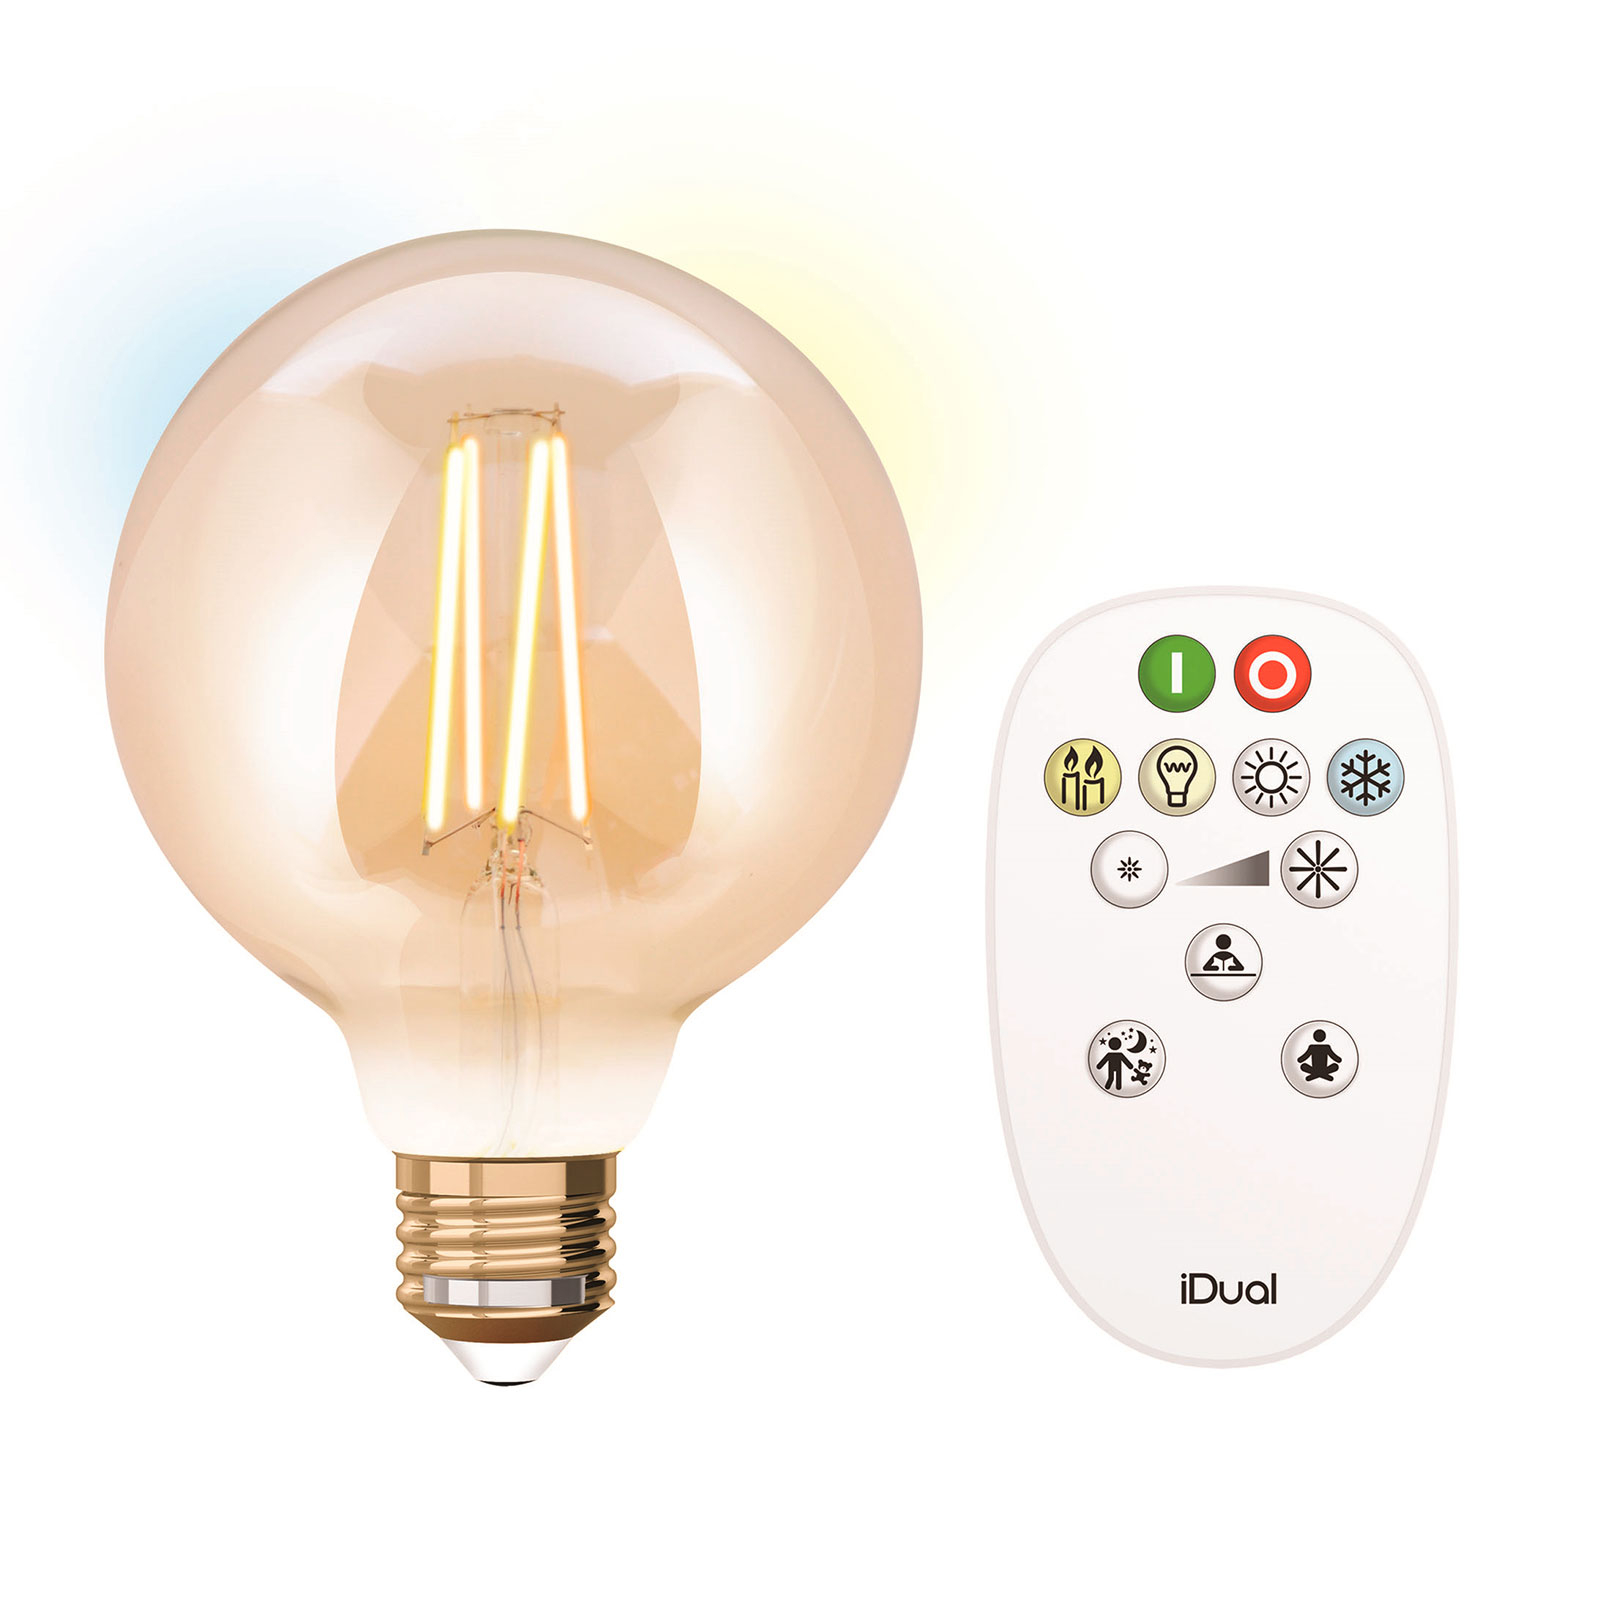 iDual LED-Lampe E27 9W m. Fernbedienung 9,5cm